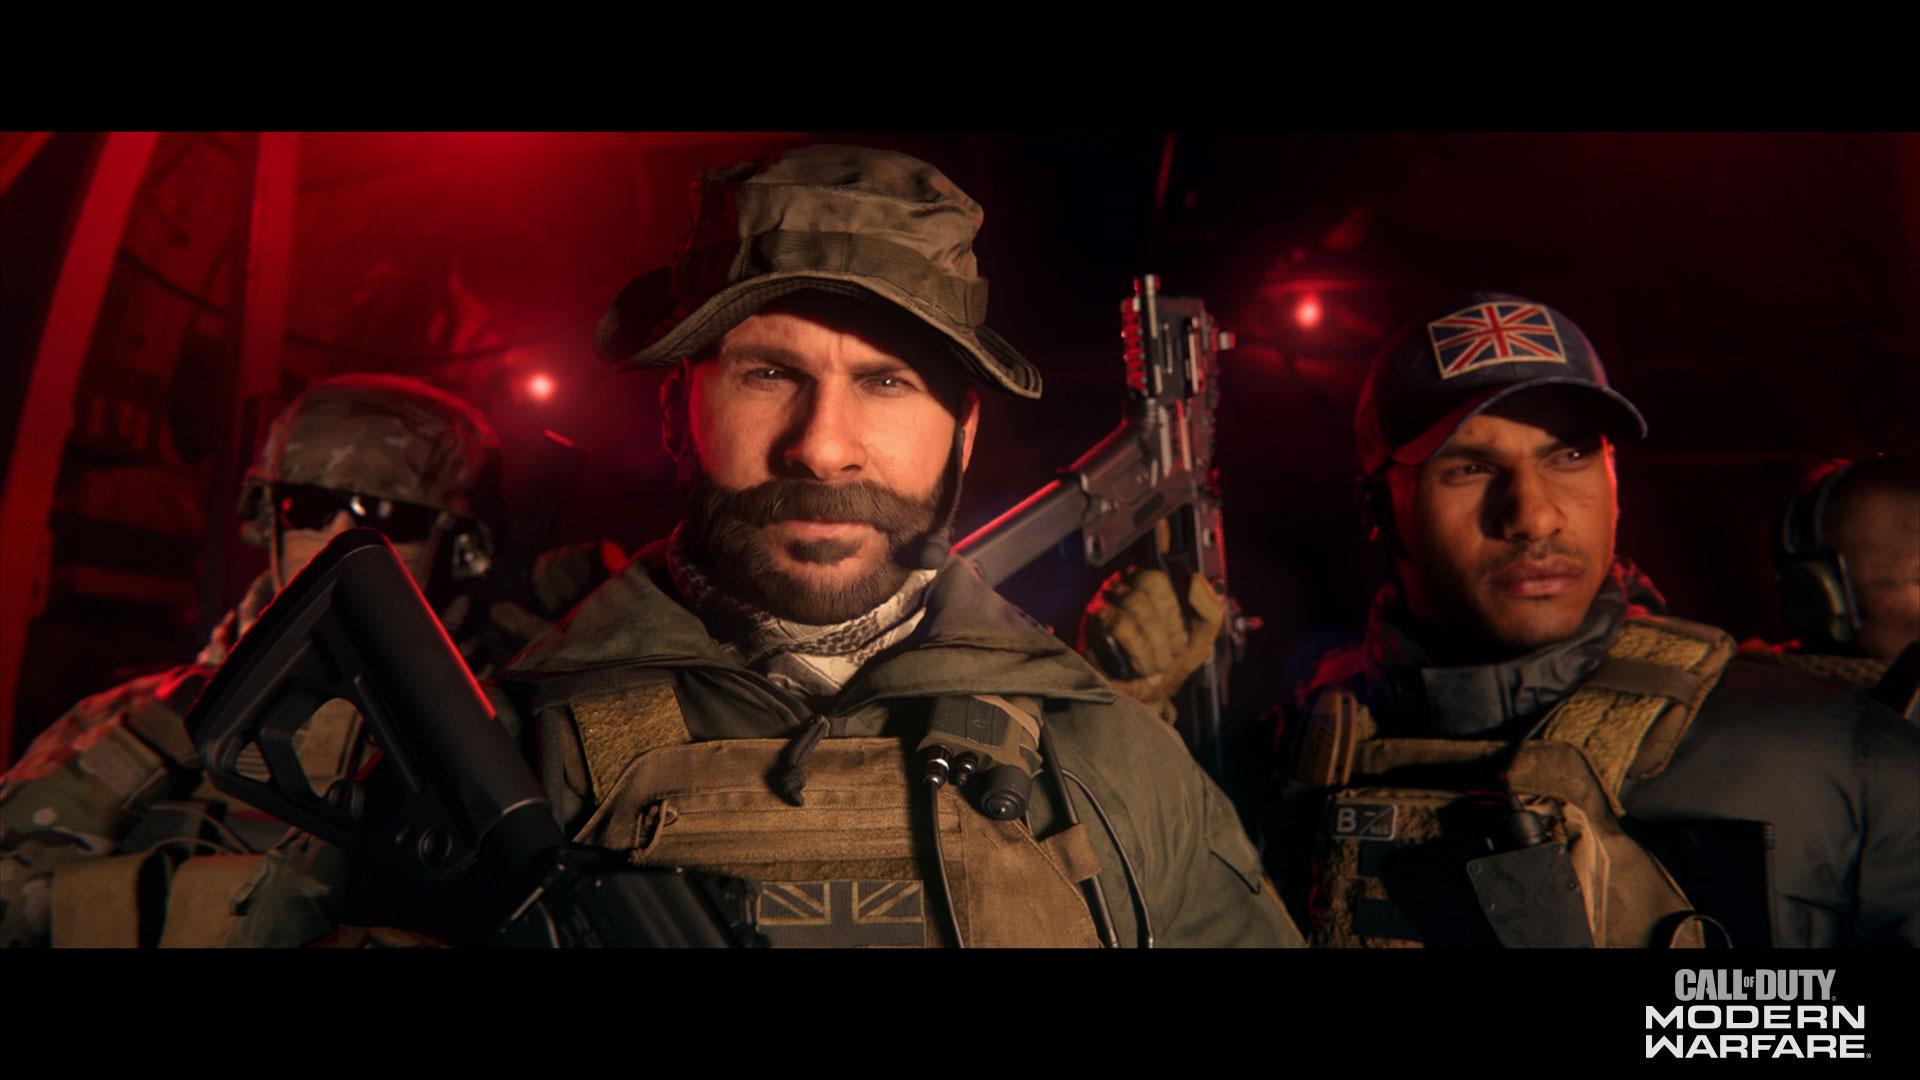 Captain Price and Gaz confirmed for Call of Duty: Modern Warfare season 4